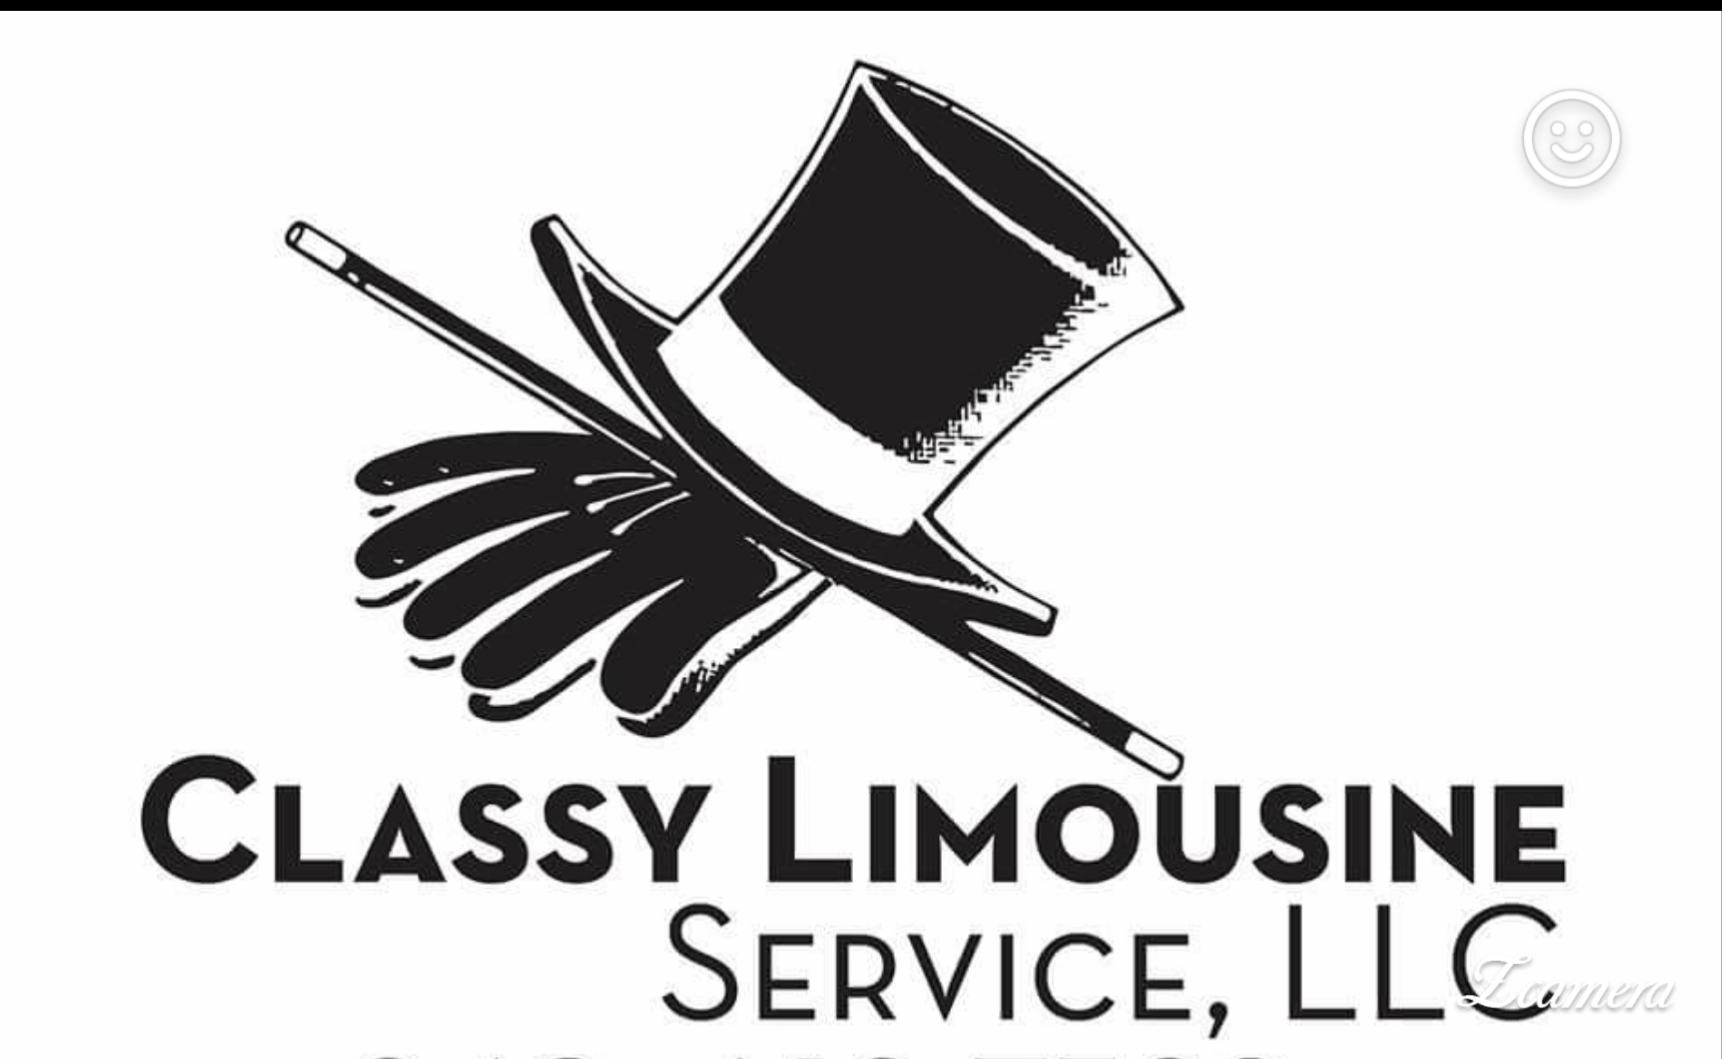 My Classy Limo Service